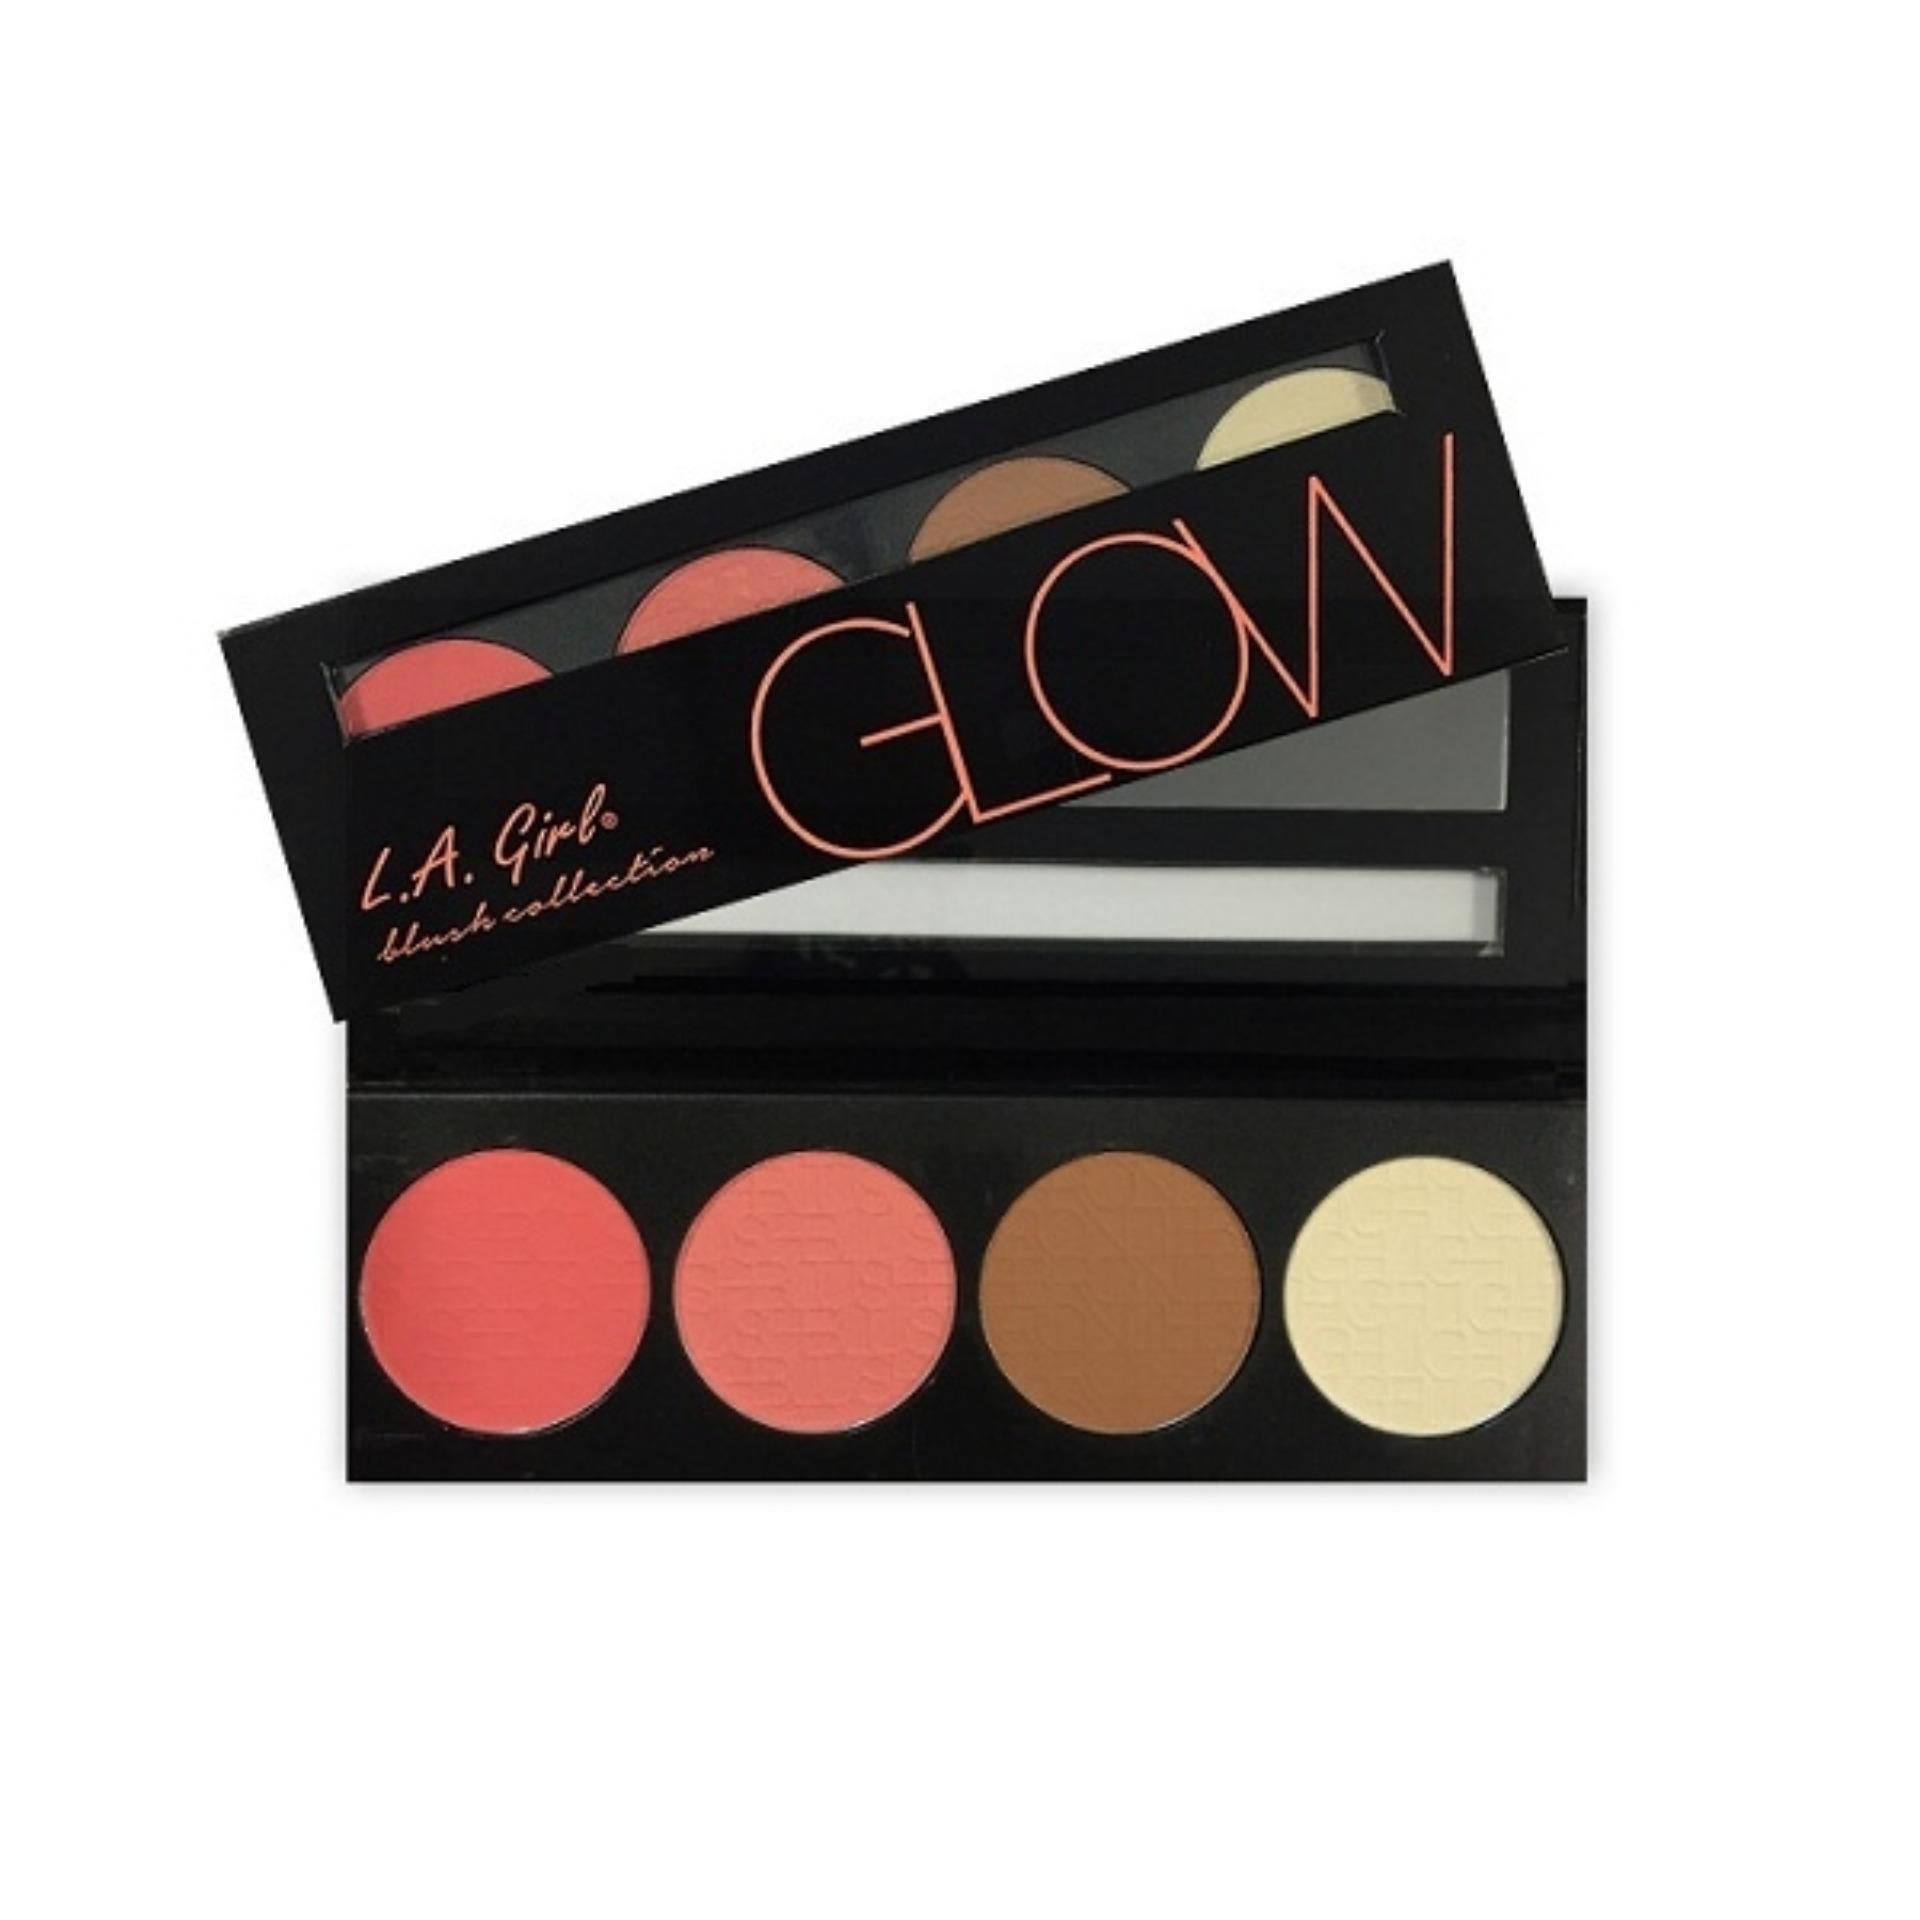 LA Girl Beauty Brick Blush Glow - Blush On, Bronzer, Highlighter, Contour, Warna Alami